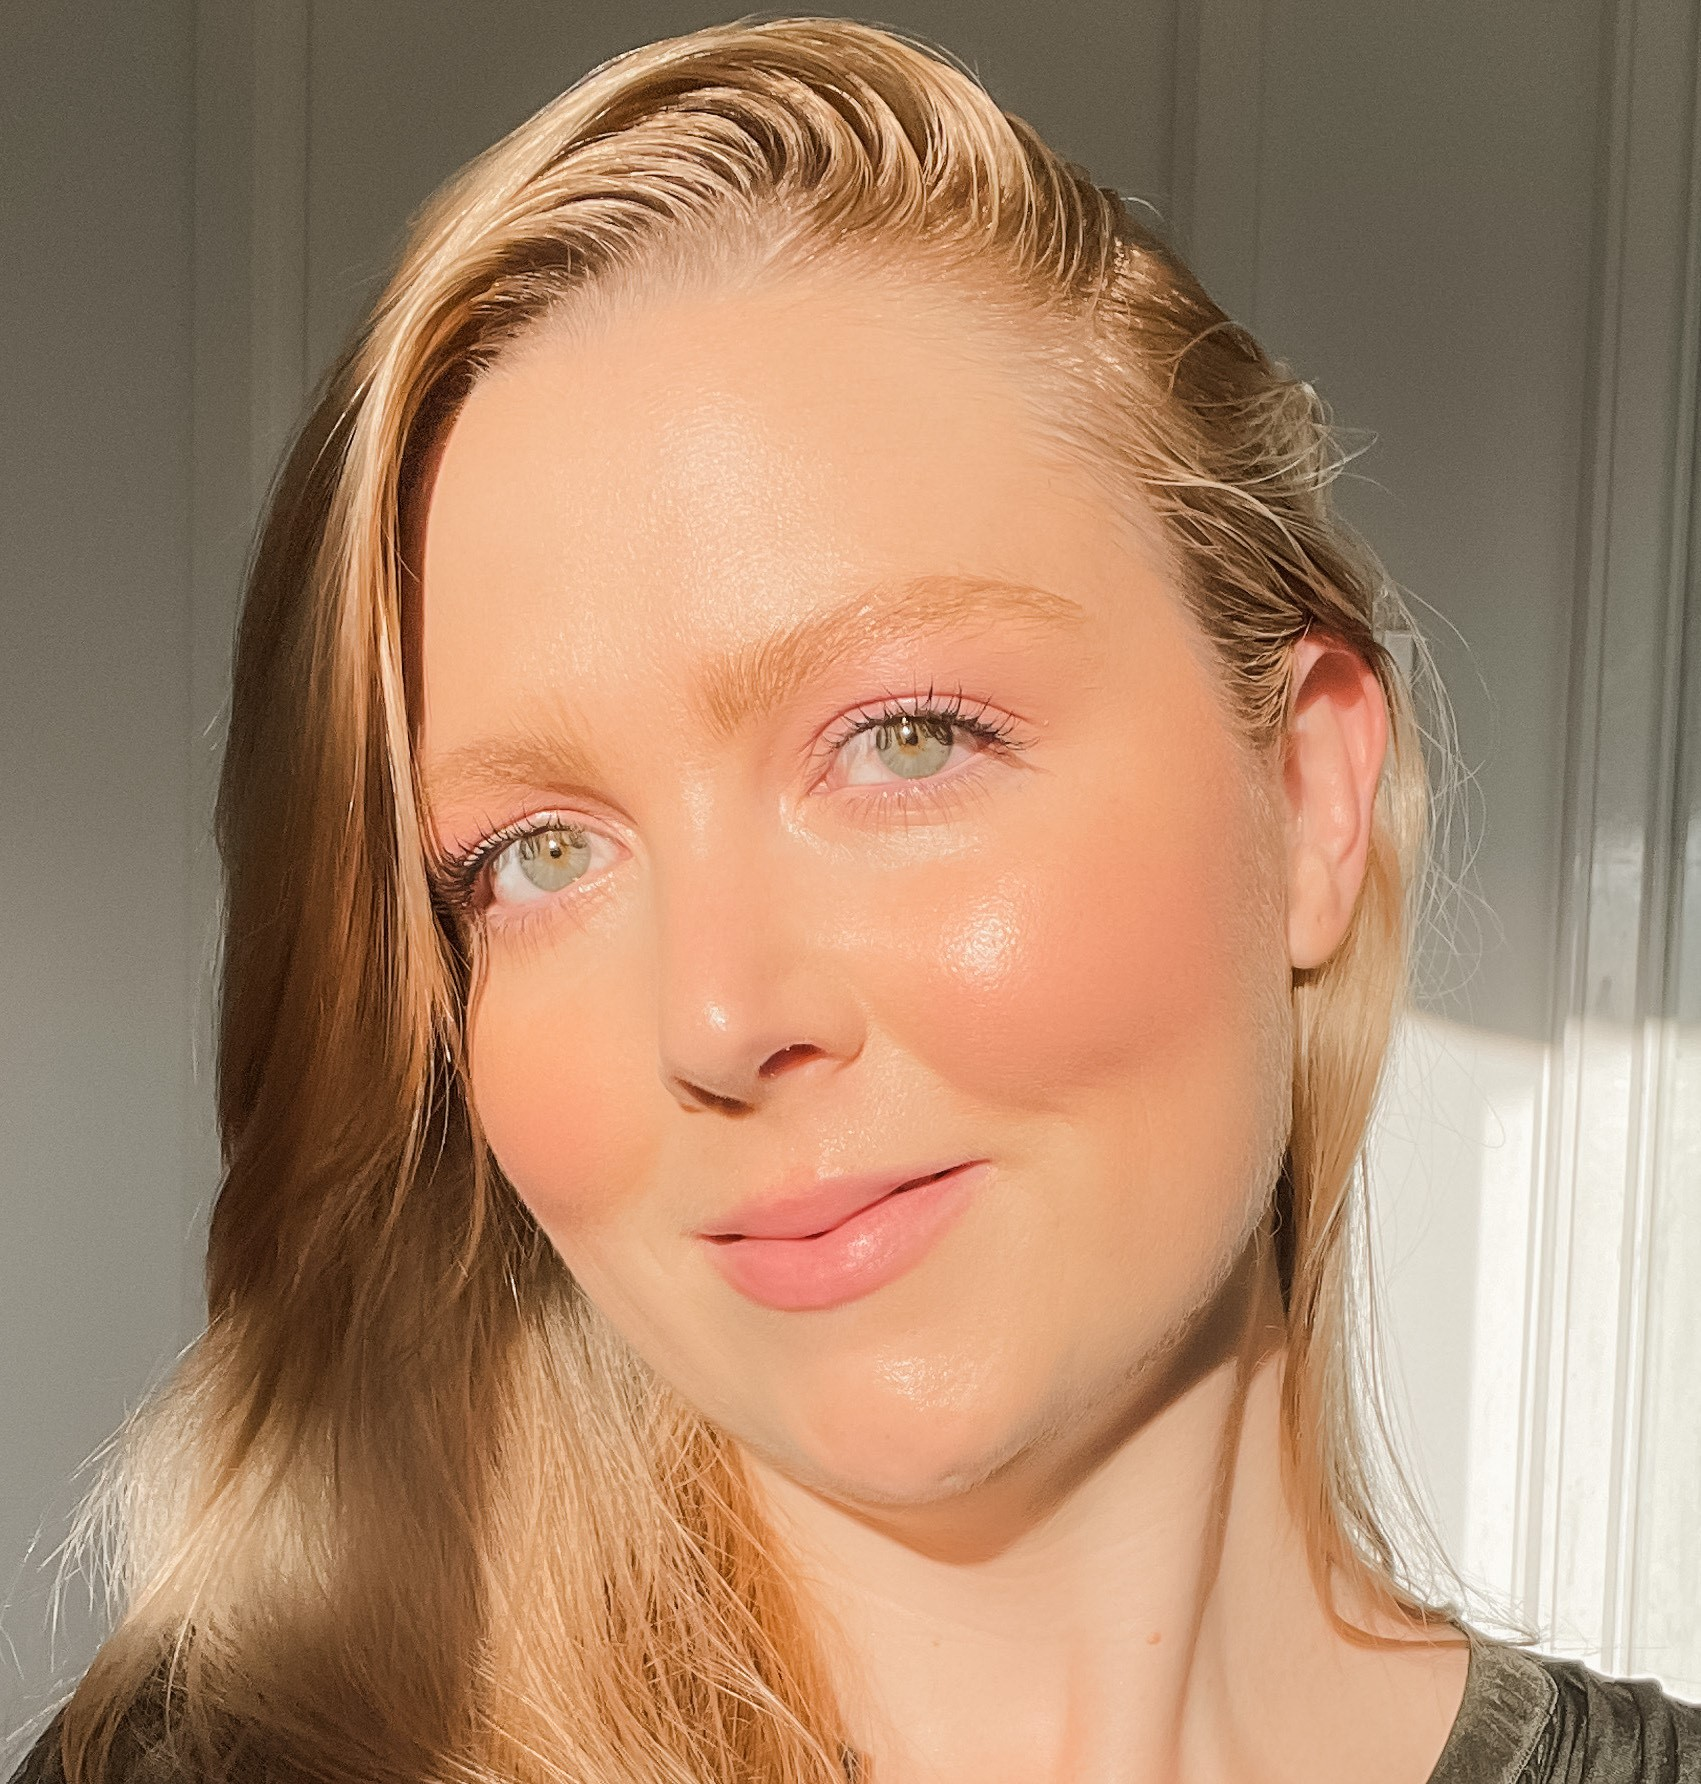 Amanda Cummerford